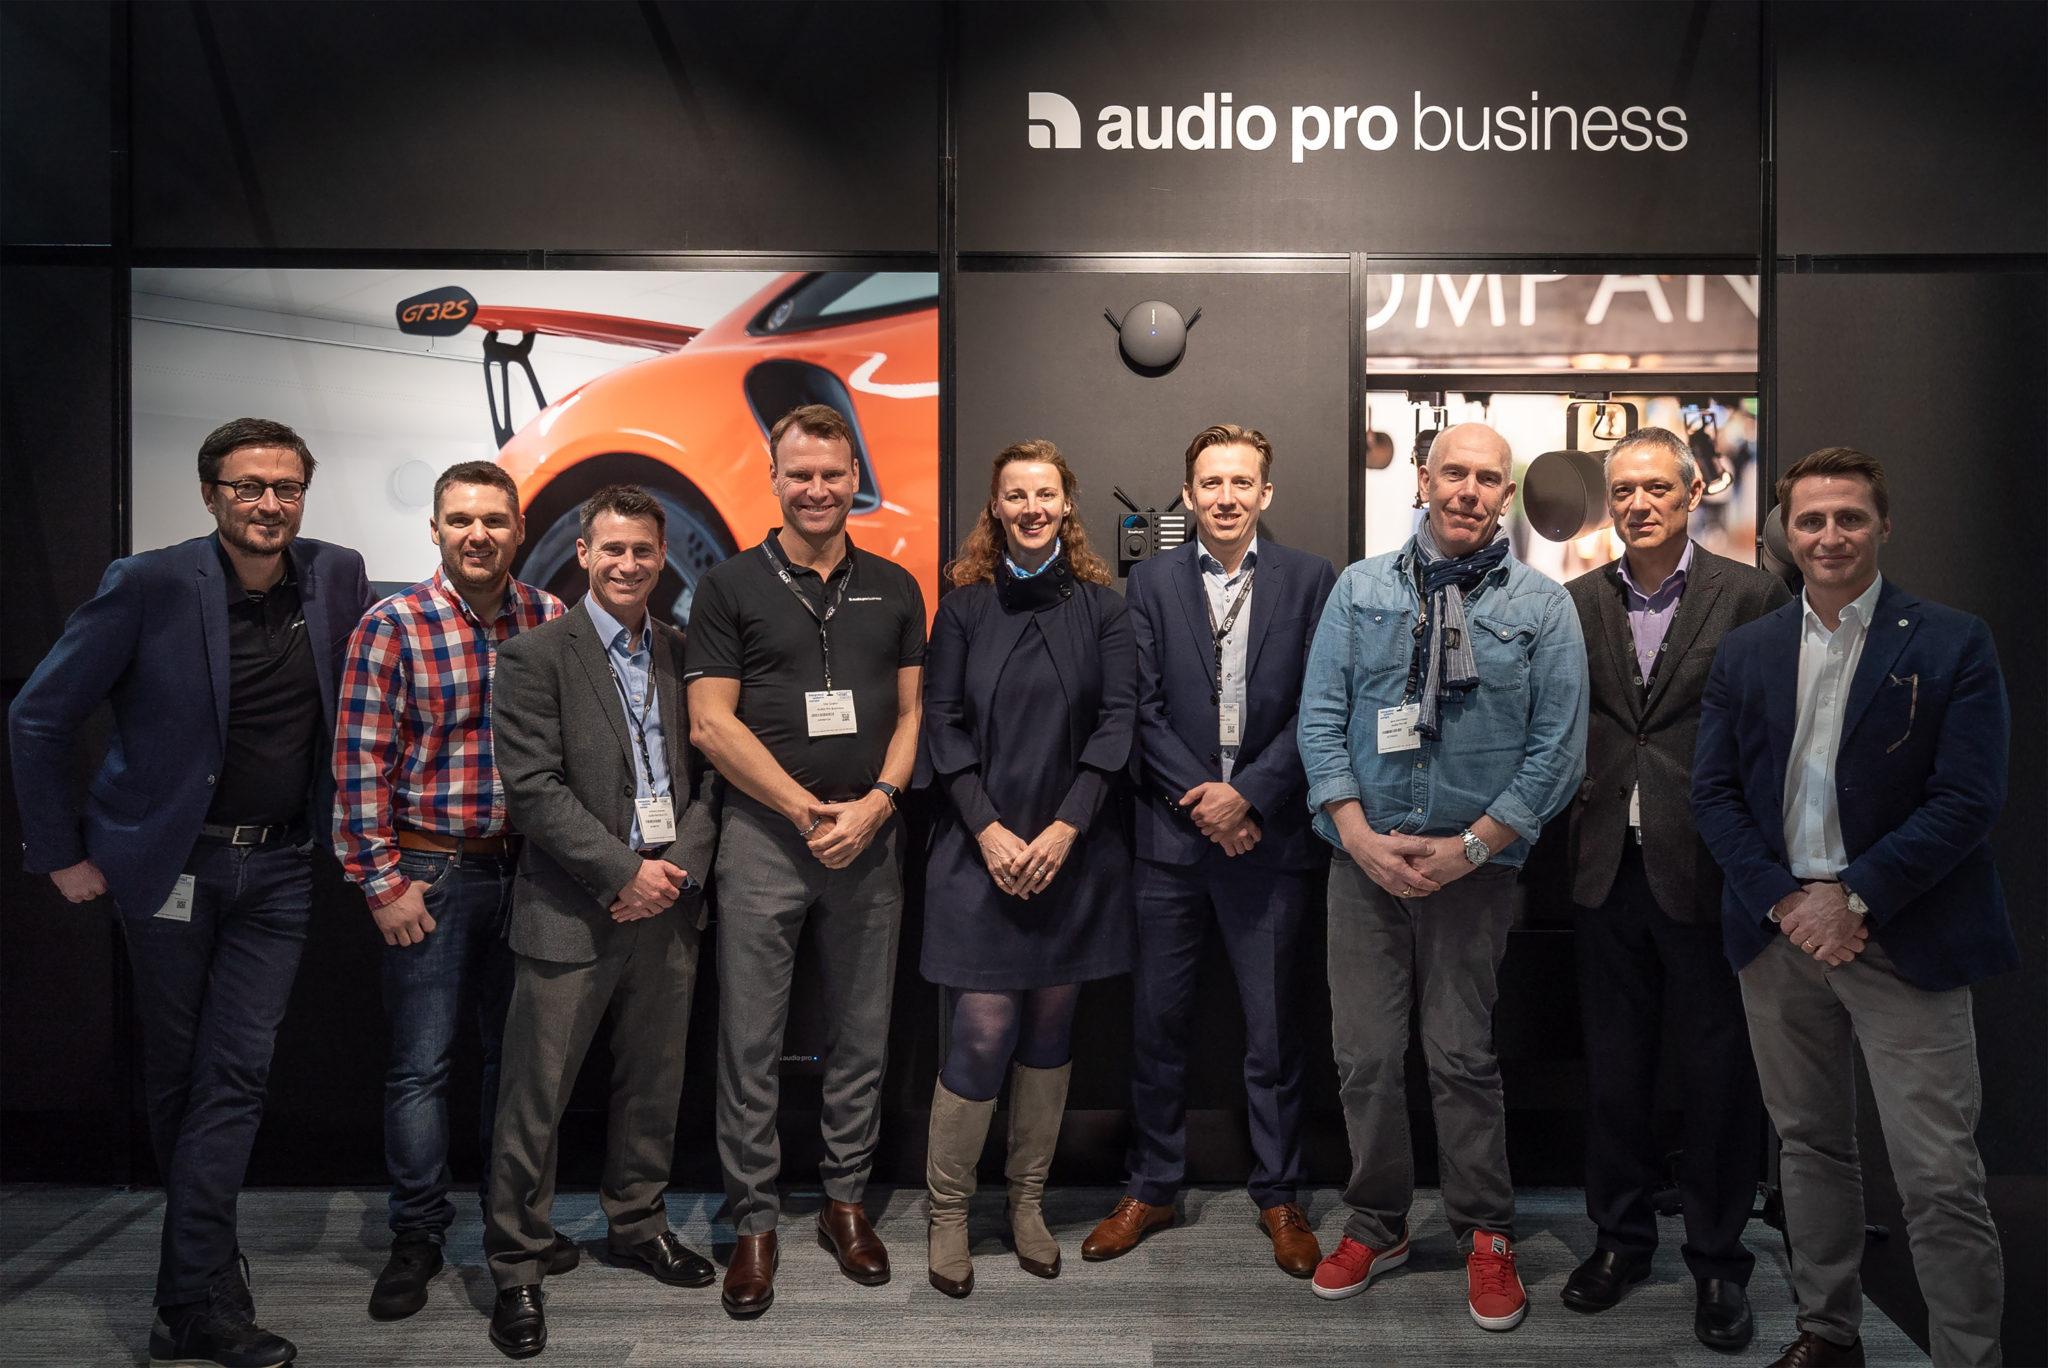 Audio-Technica to distribute Audio Pro Business